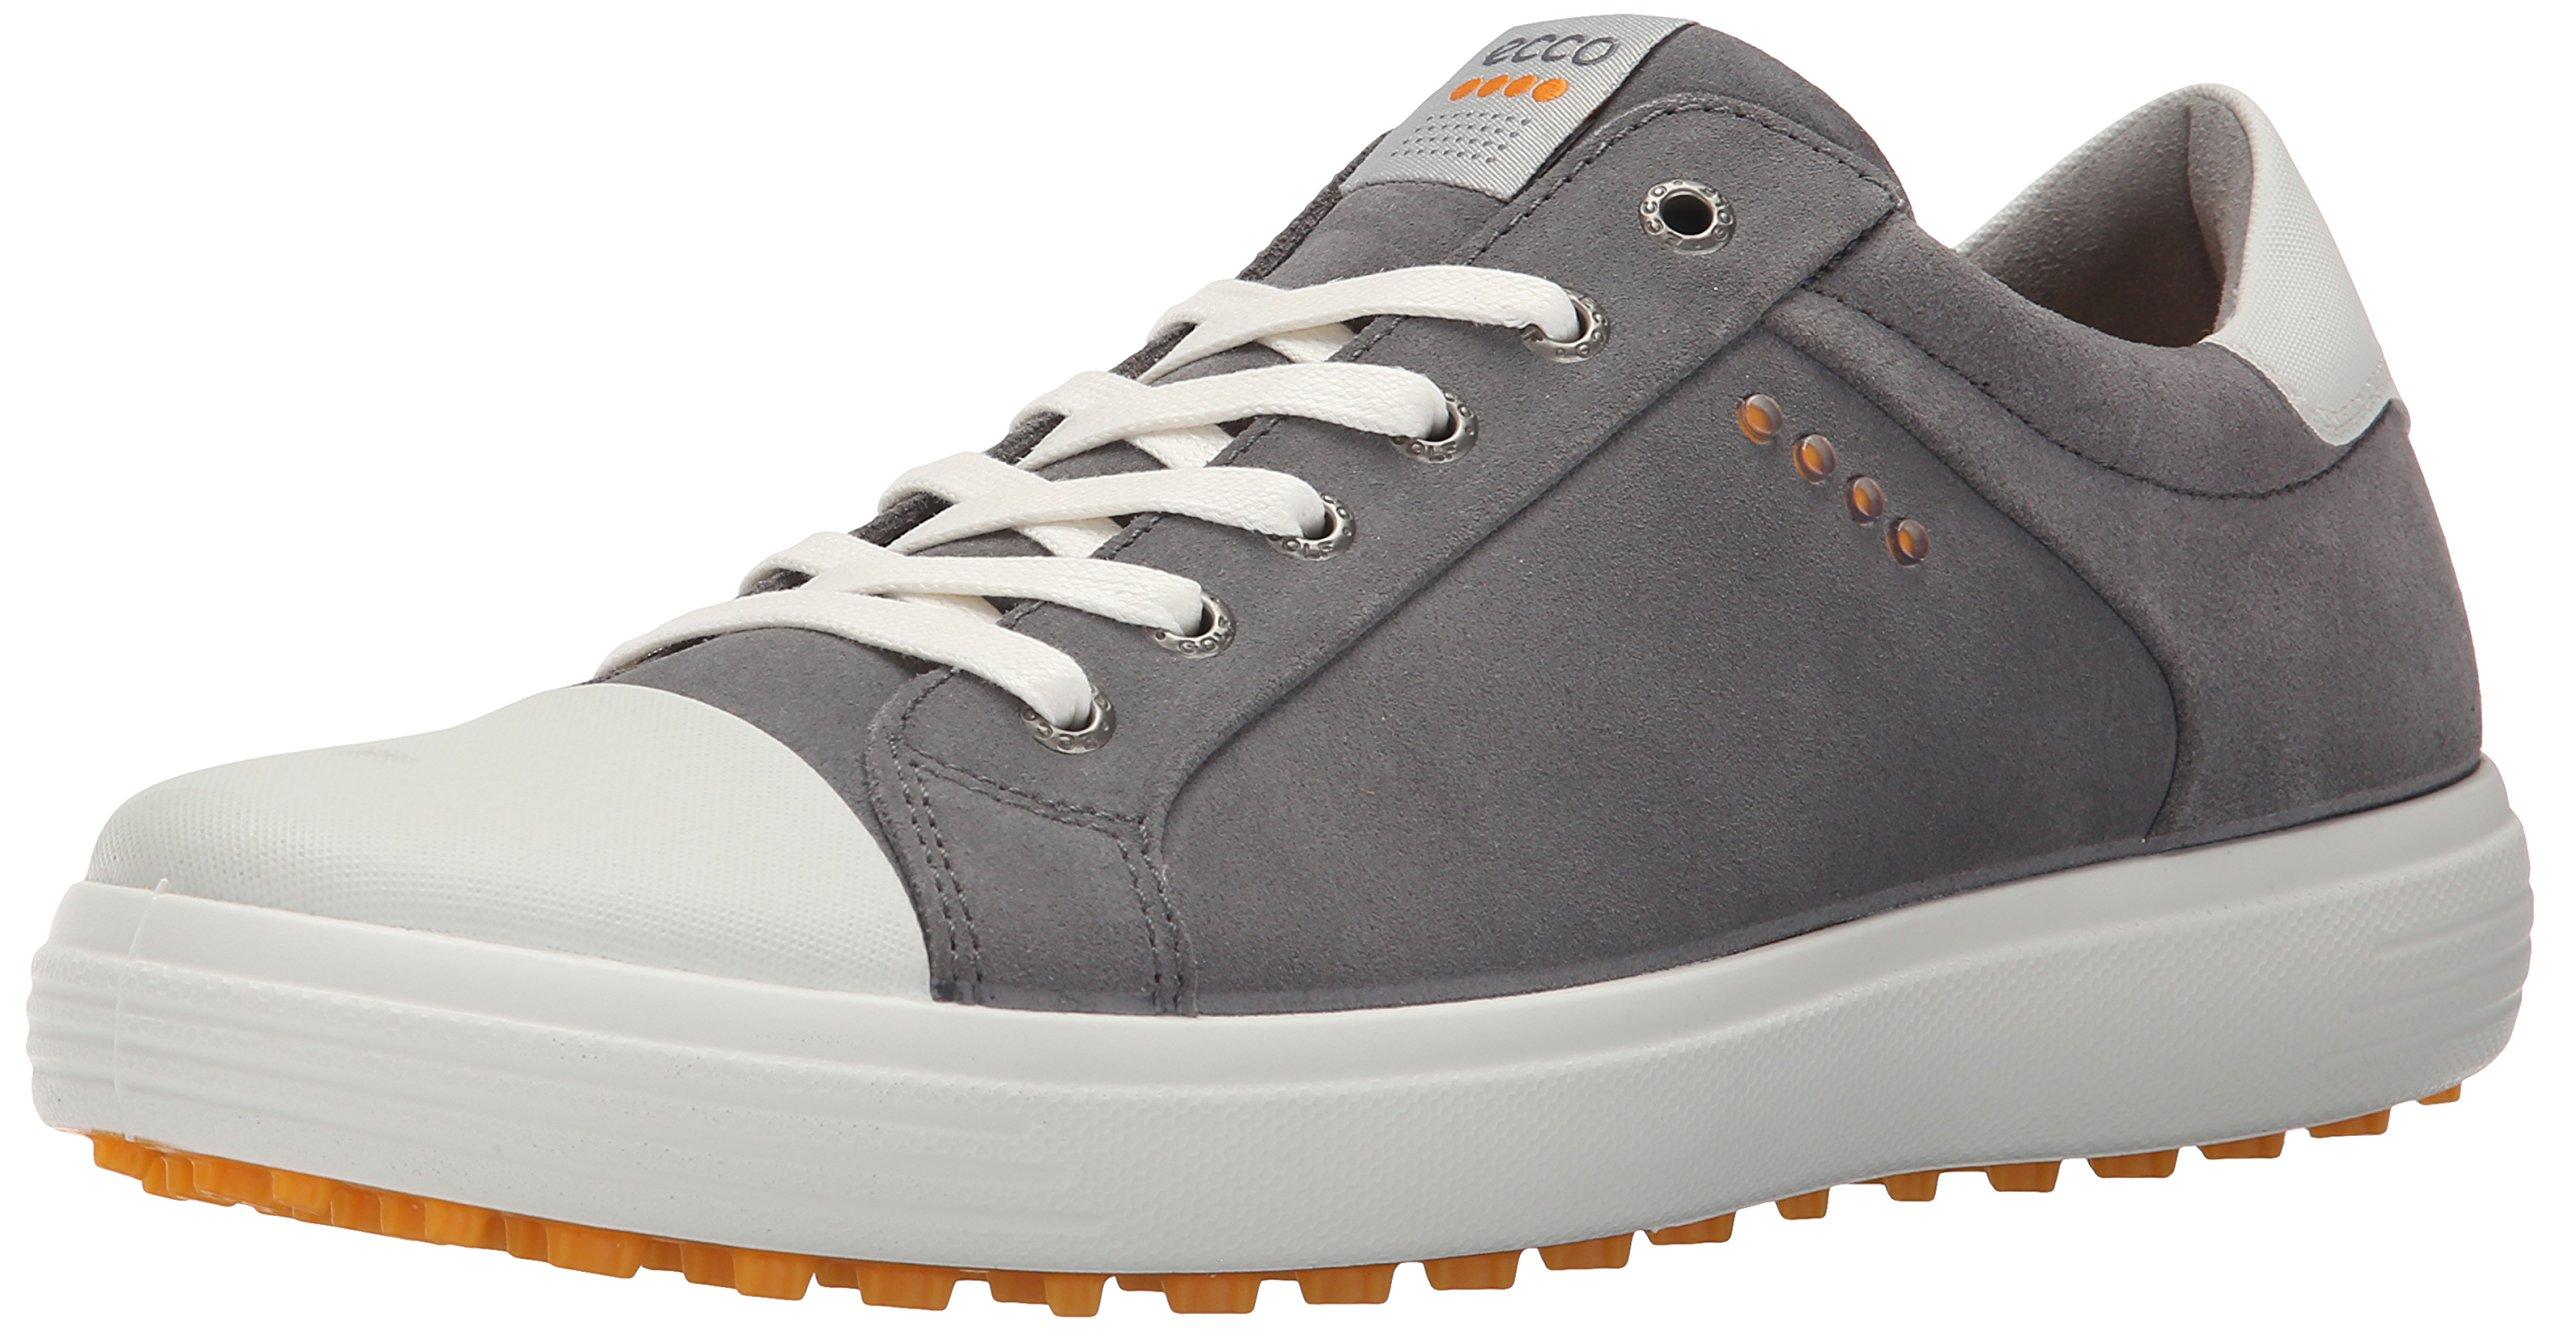 ECCO Men's Casual Hybrid Golf Shoe, Titanium/White, 46 EU/12-12.5 M US